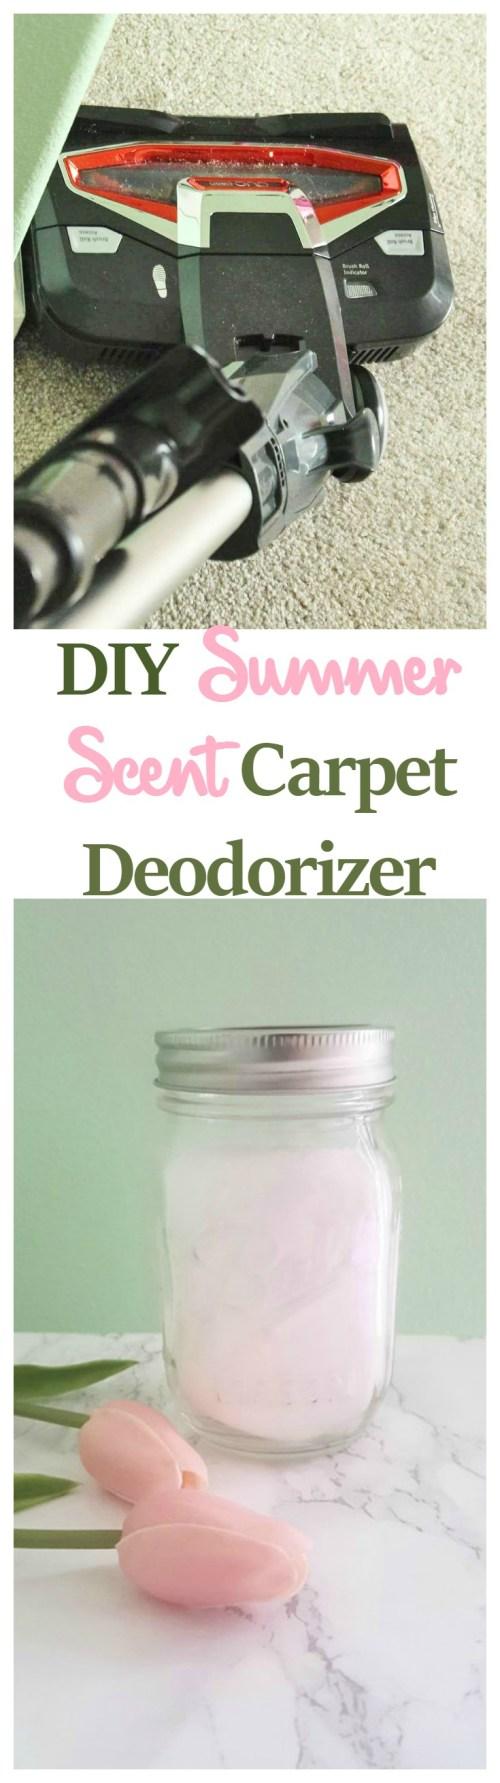 DIY Summer Scent Carpet Deodorizer